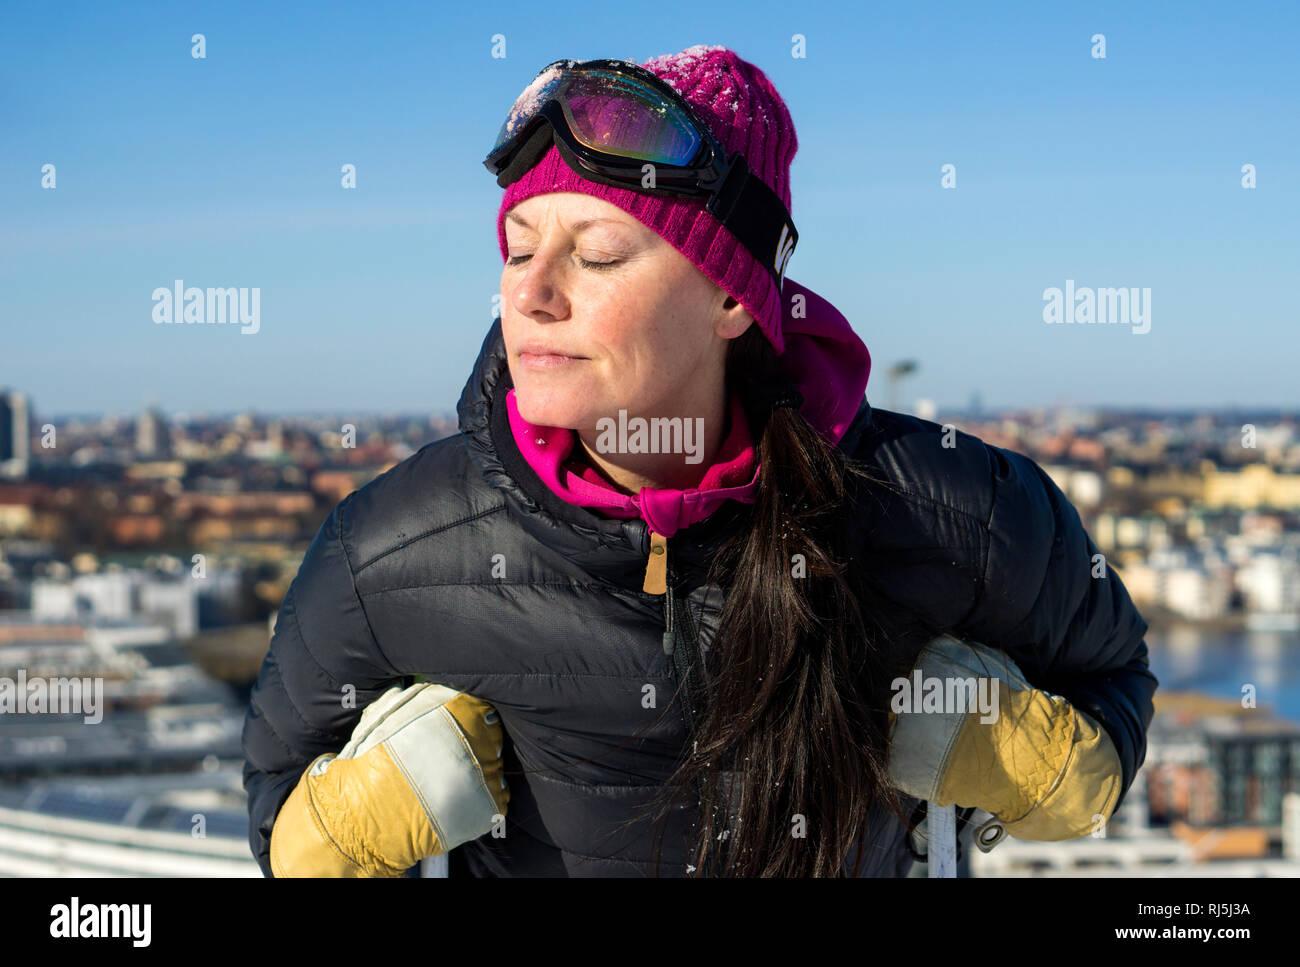 A woman skier Stock Photo